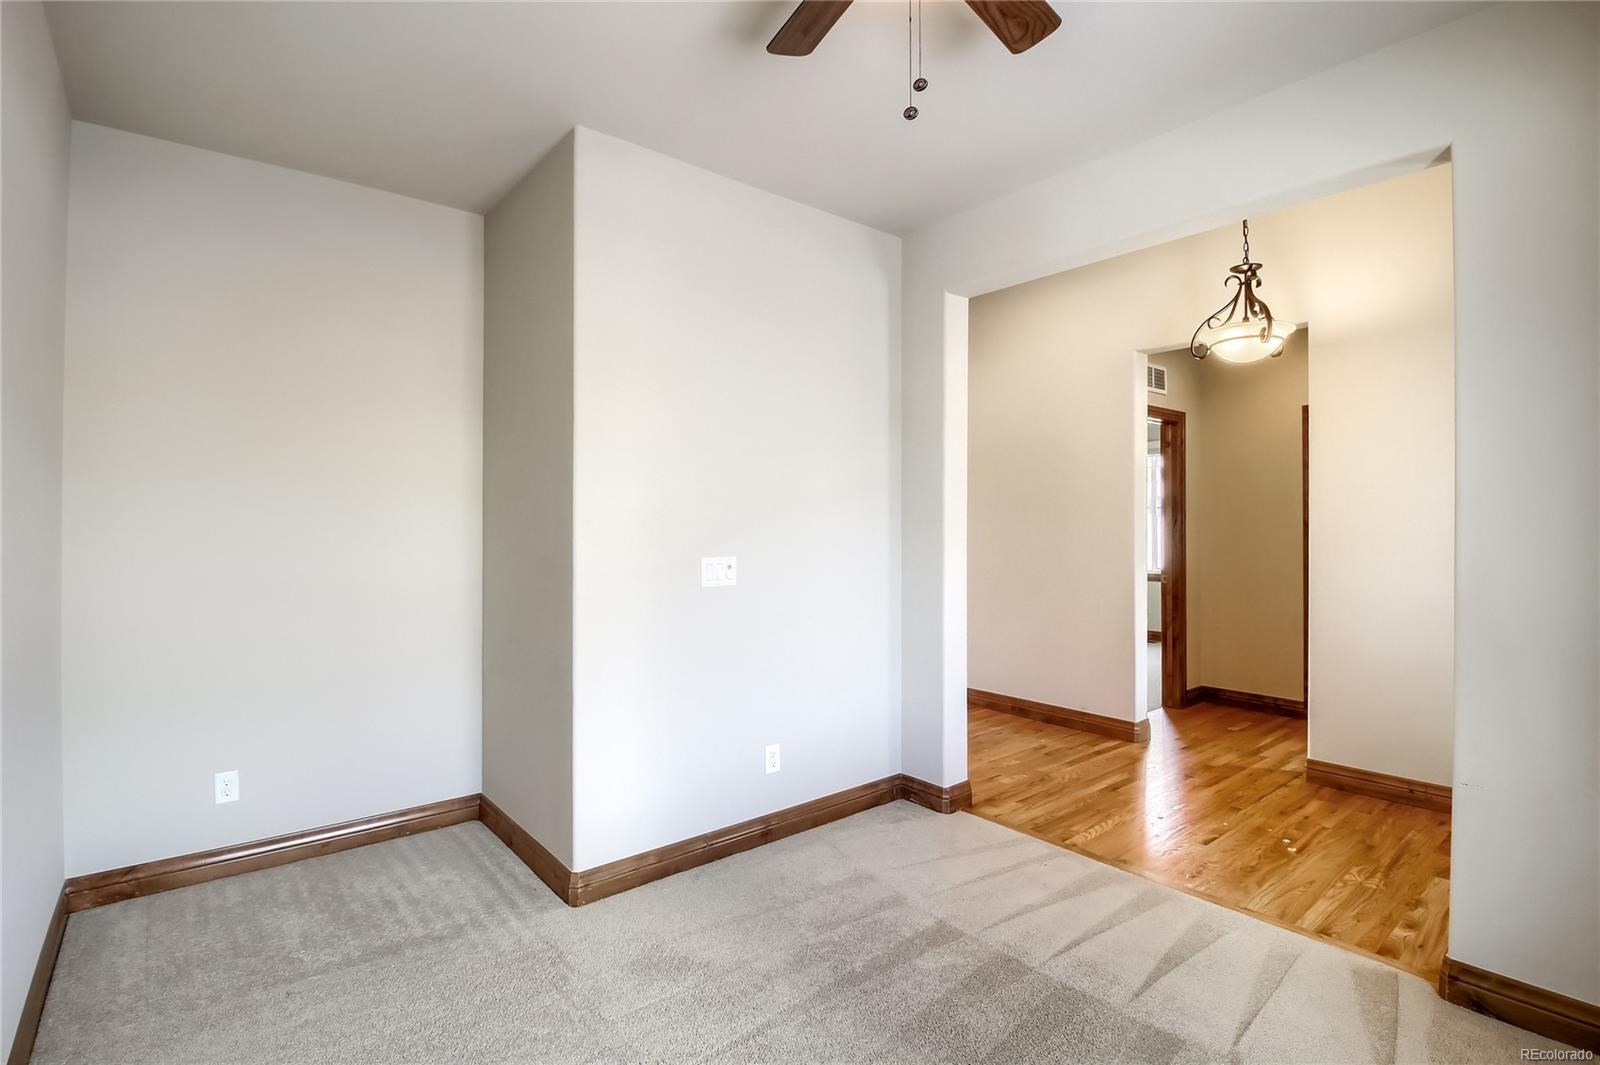 MLS# 4362334 - 25 - 4234 Manorbrier Circle, Castle Rock, CO 80104